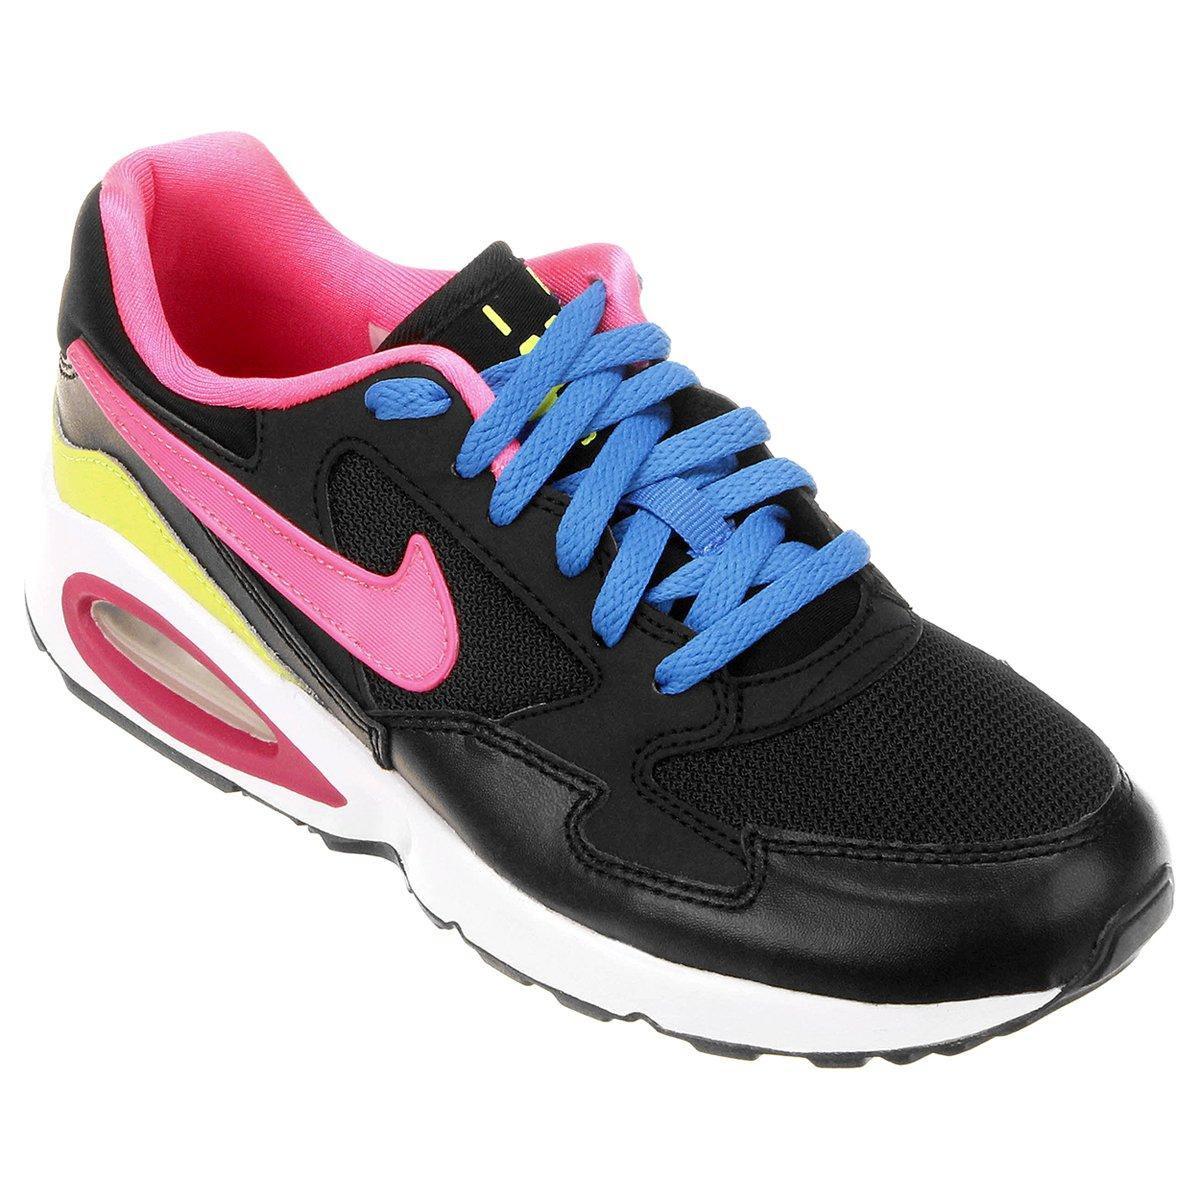 444b938f0 Tênis Nike Air Max ST Juvenil | Shop Timão